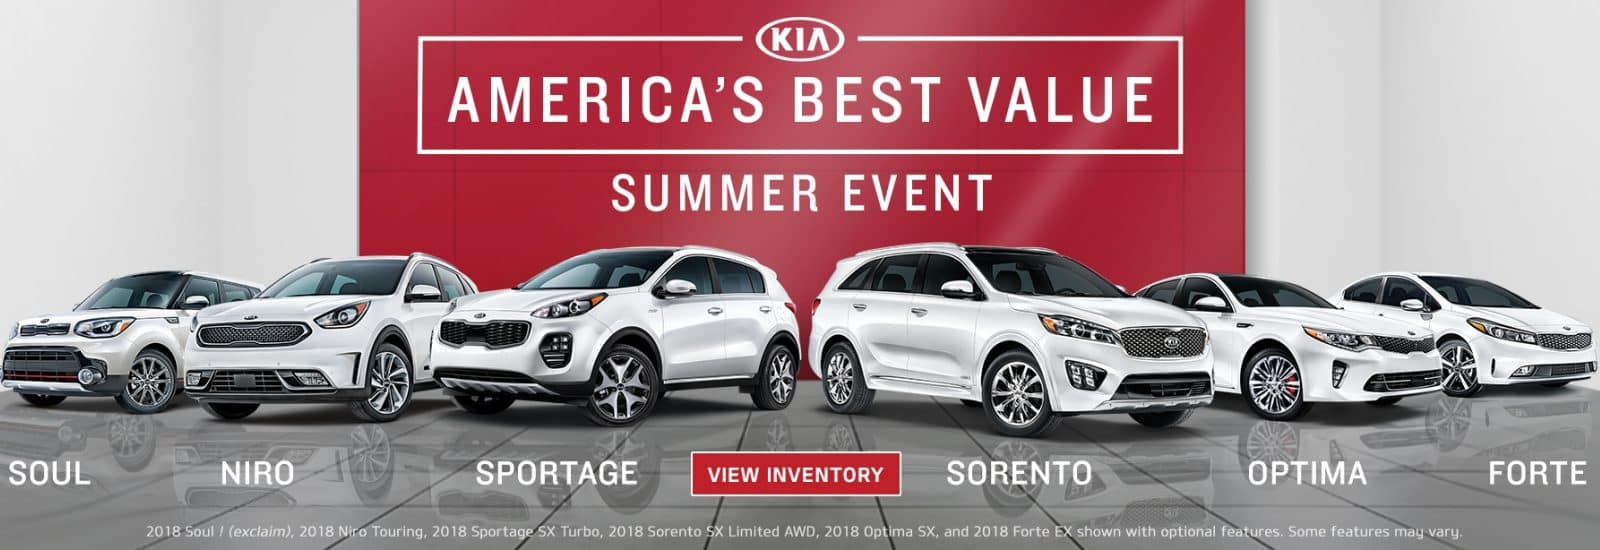 Kia Dealer In Indianapolis | Ray Skillman Westside Kia